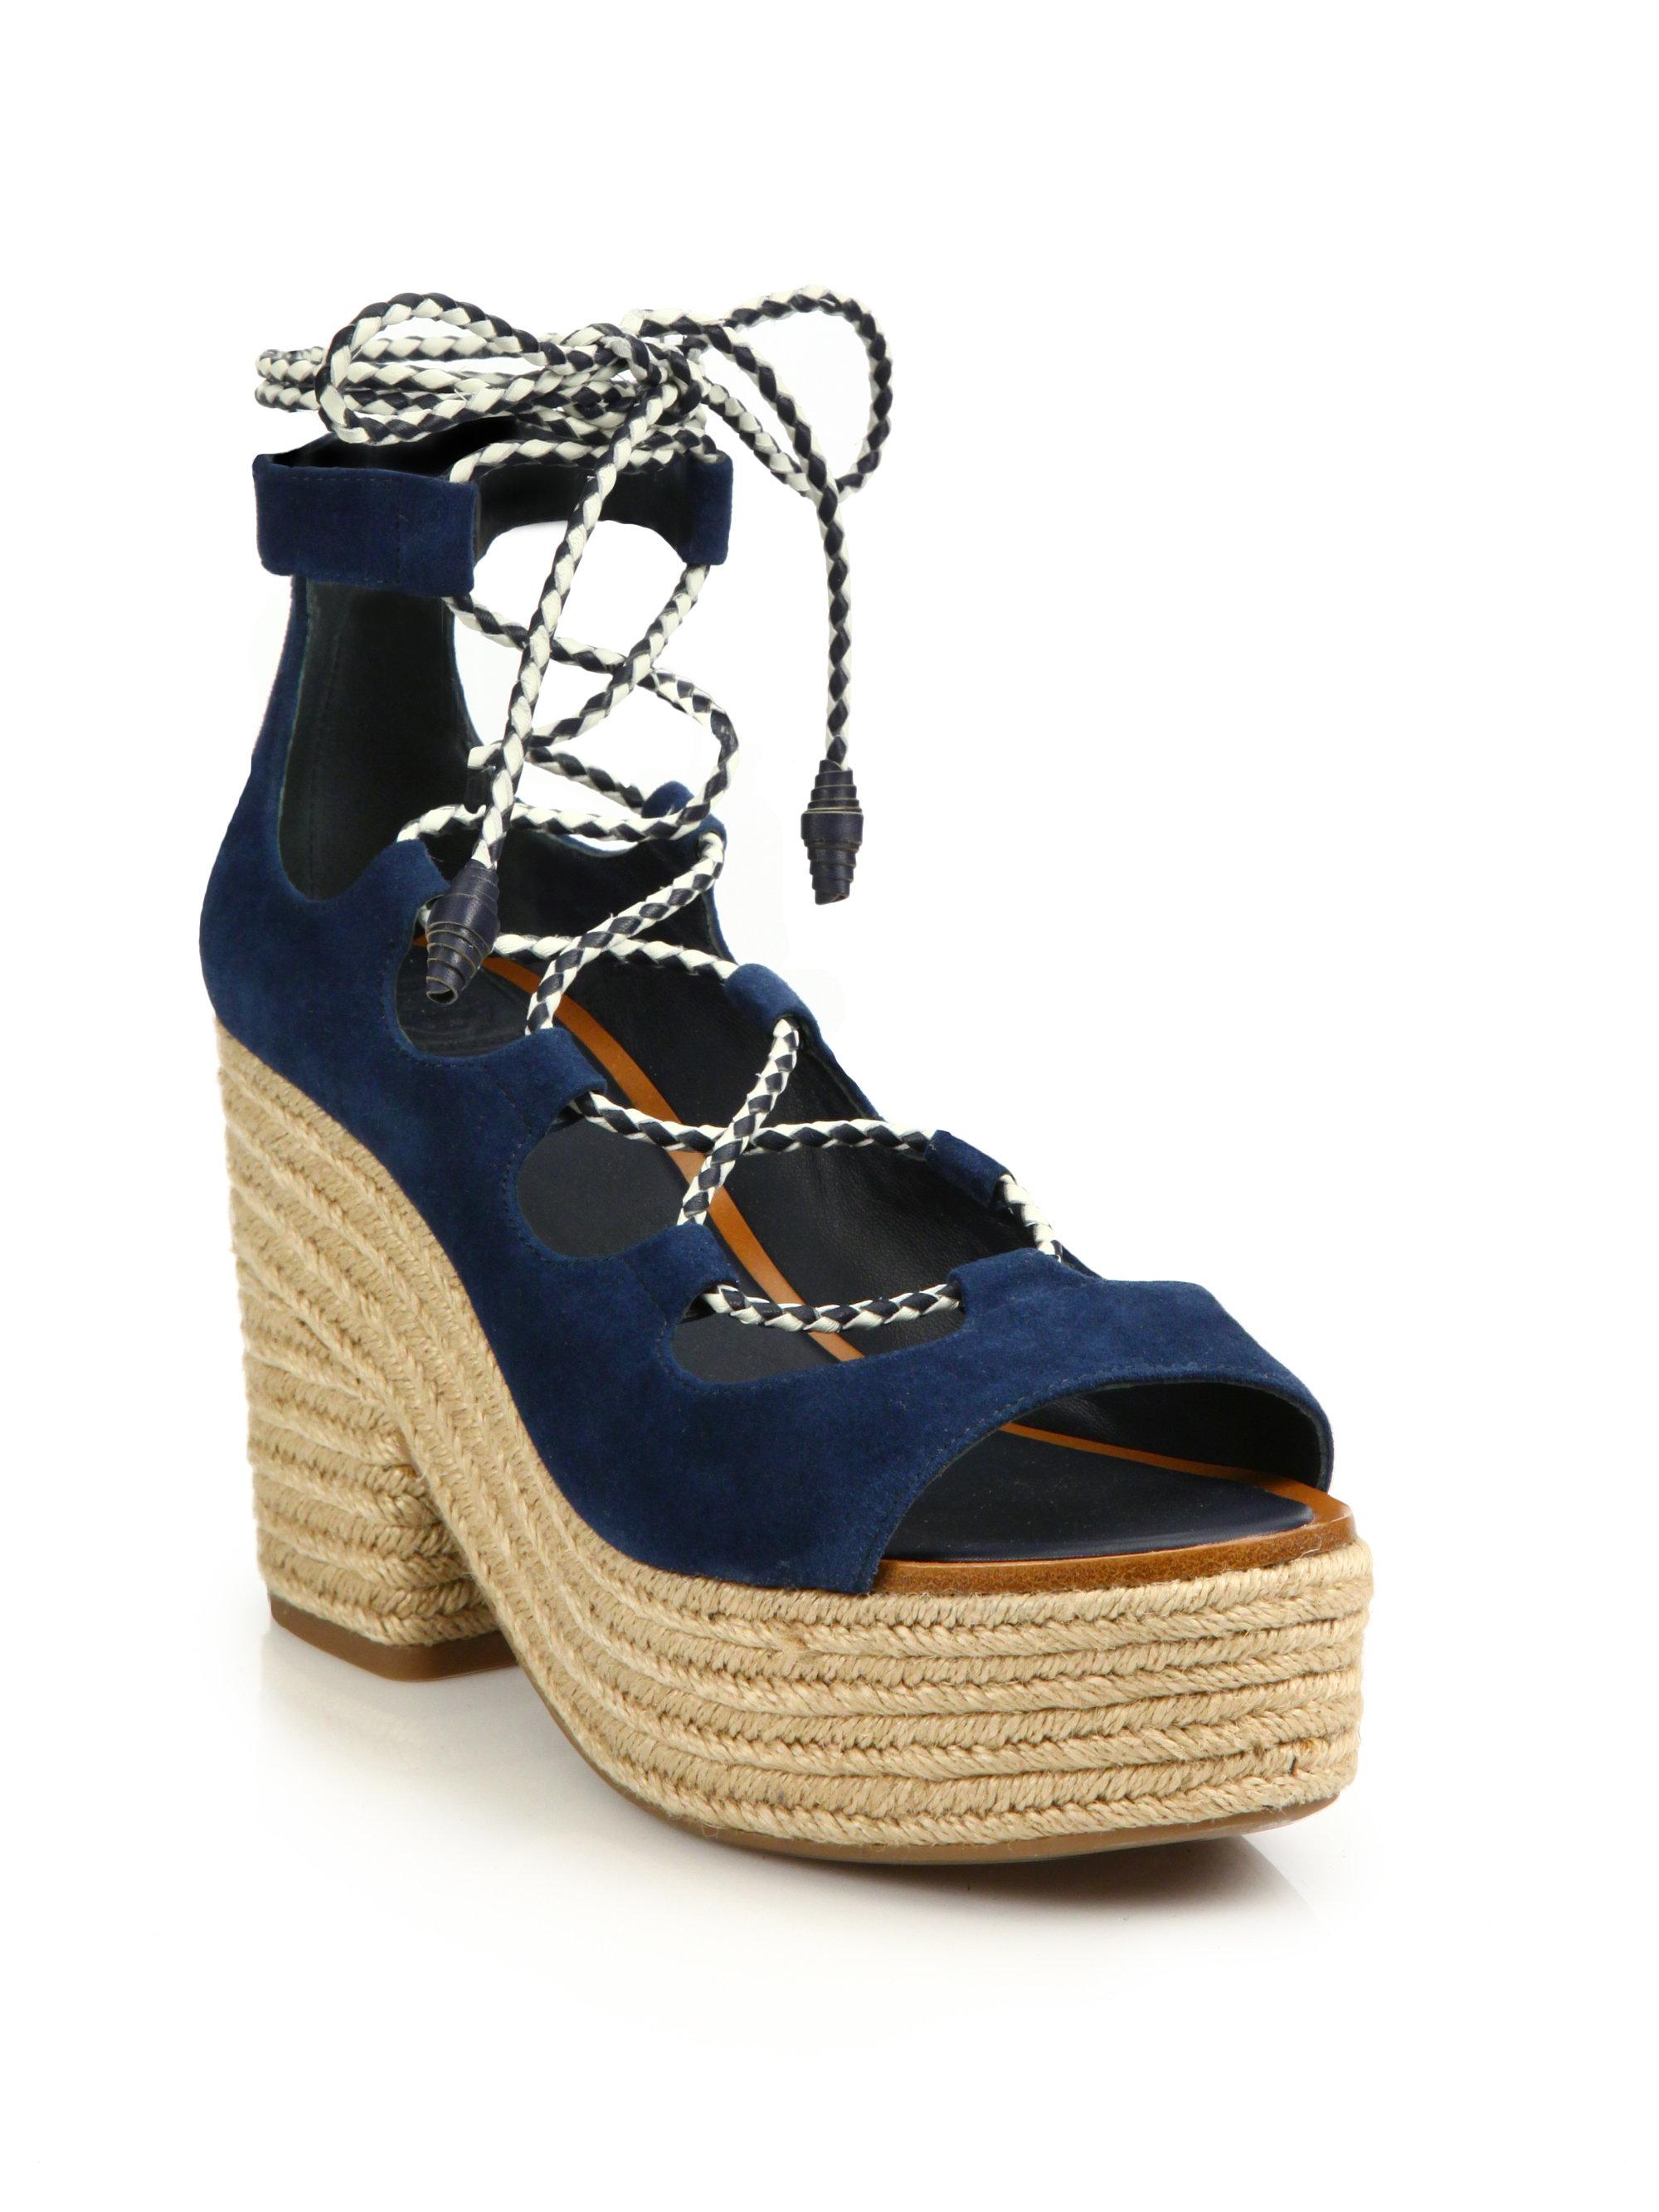 c7eff9925493 Lyst - Tory Burch Positano Suede Lace-up Espadrille Platform Sandals ...